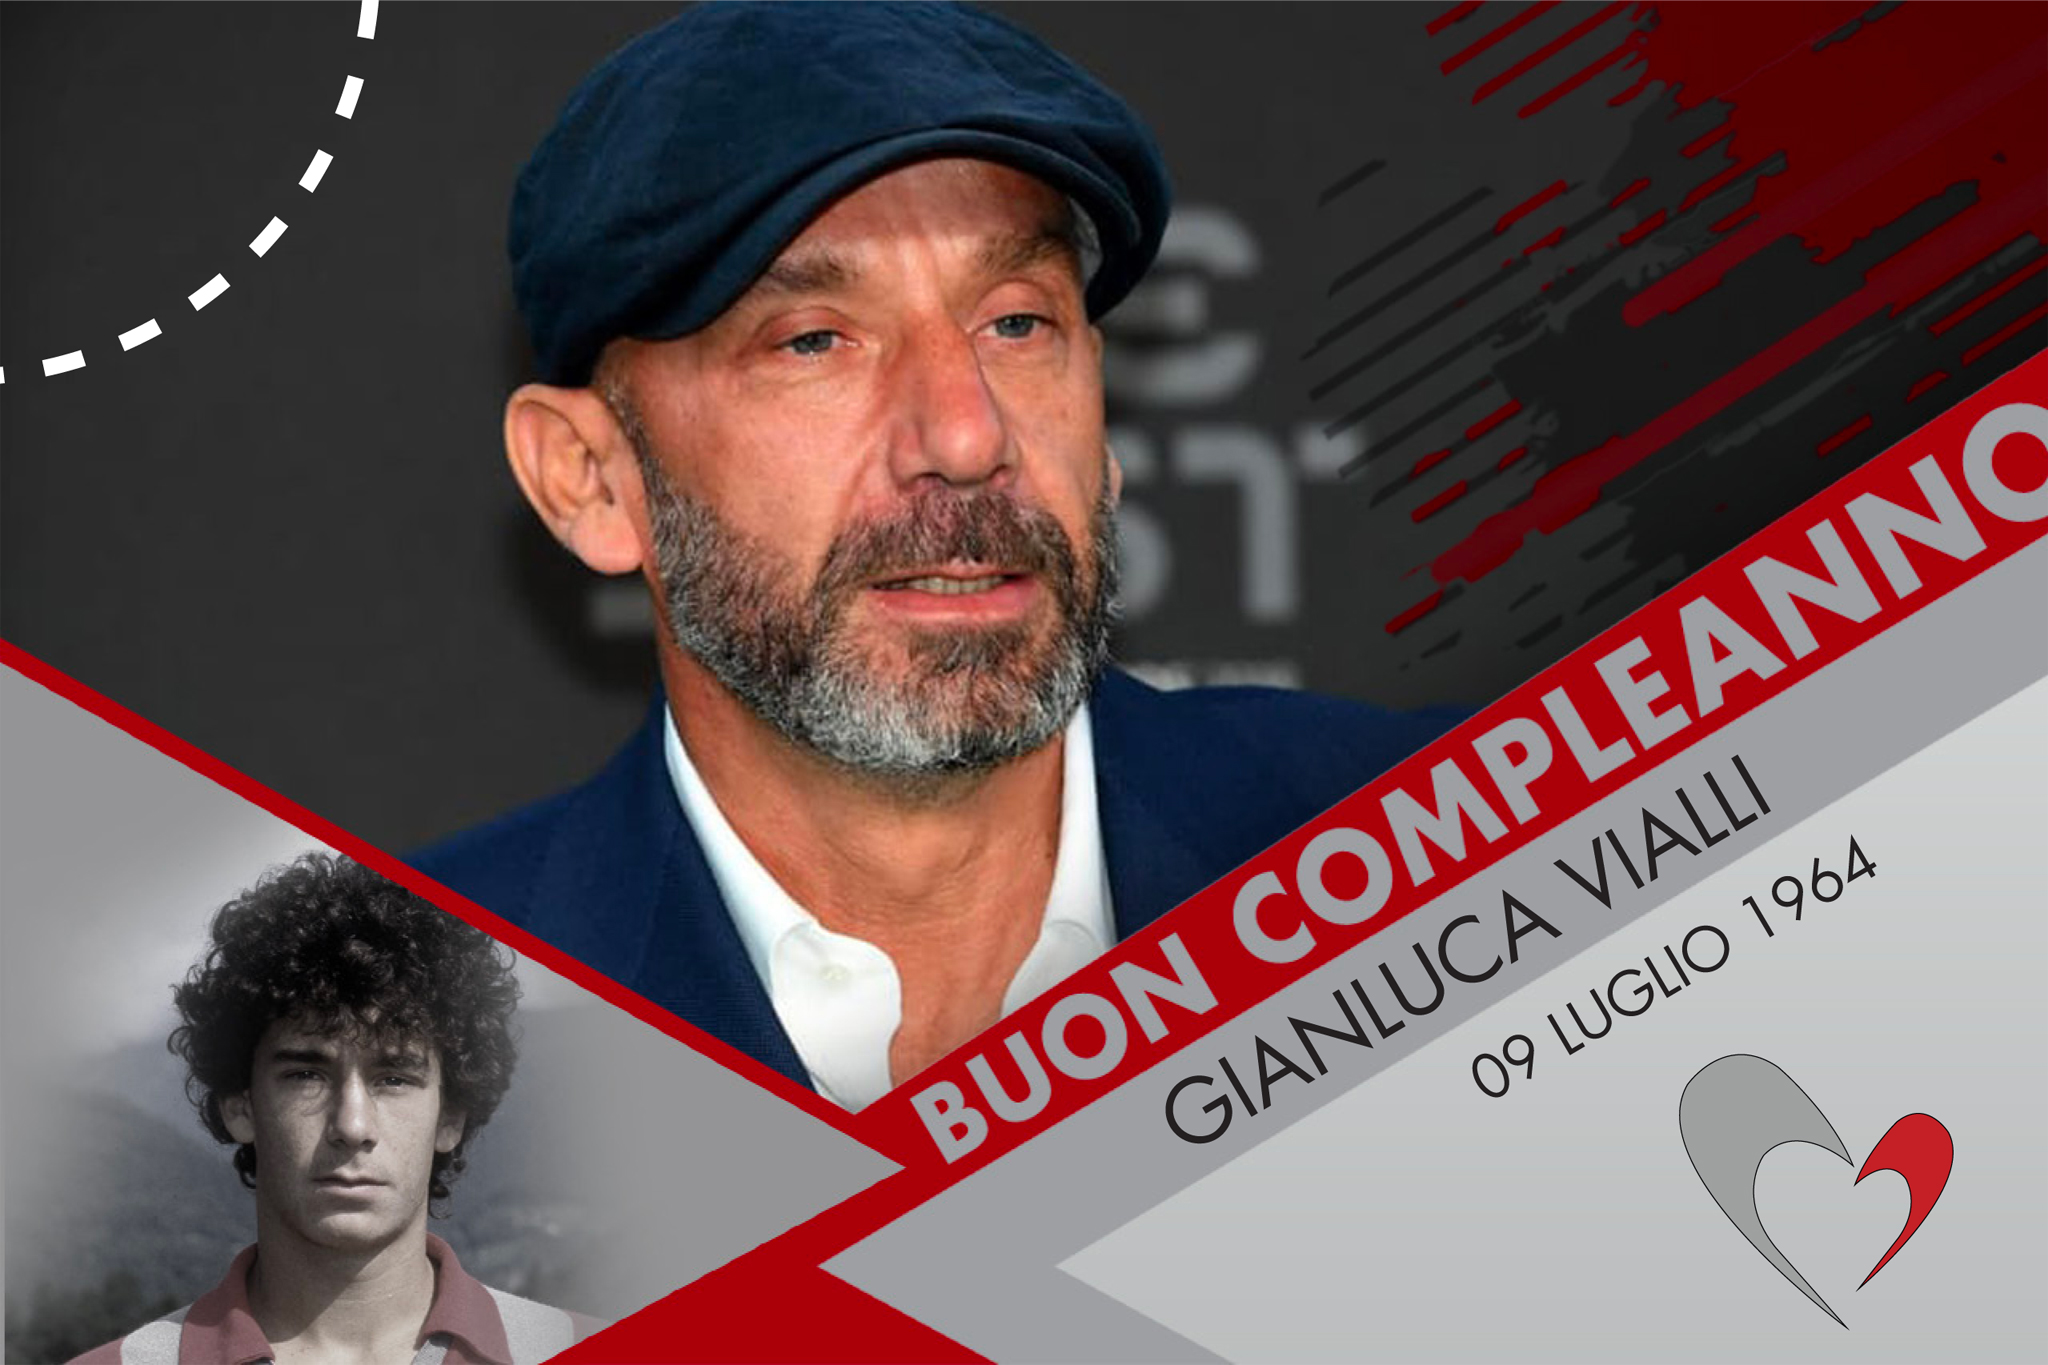 Gianluca Vialli, dalla Cremonese al mondo